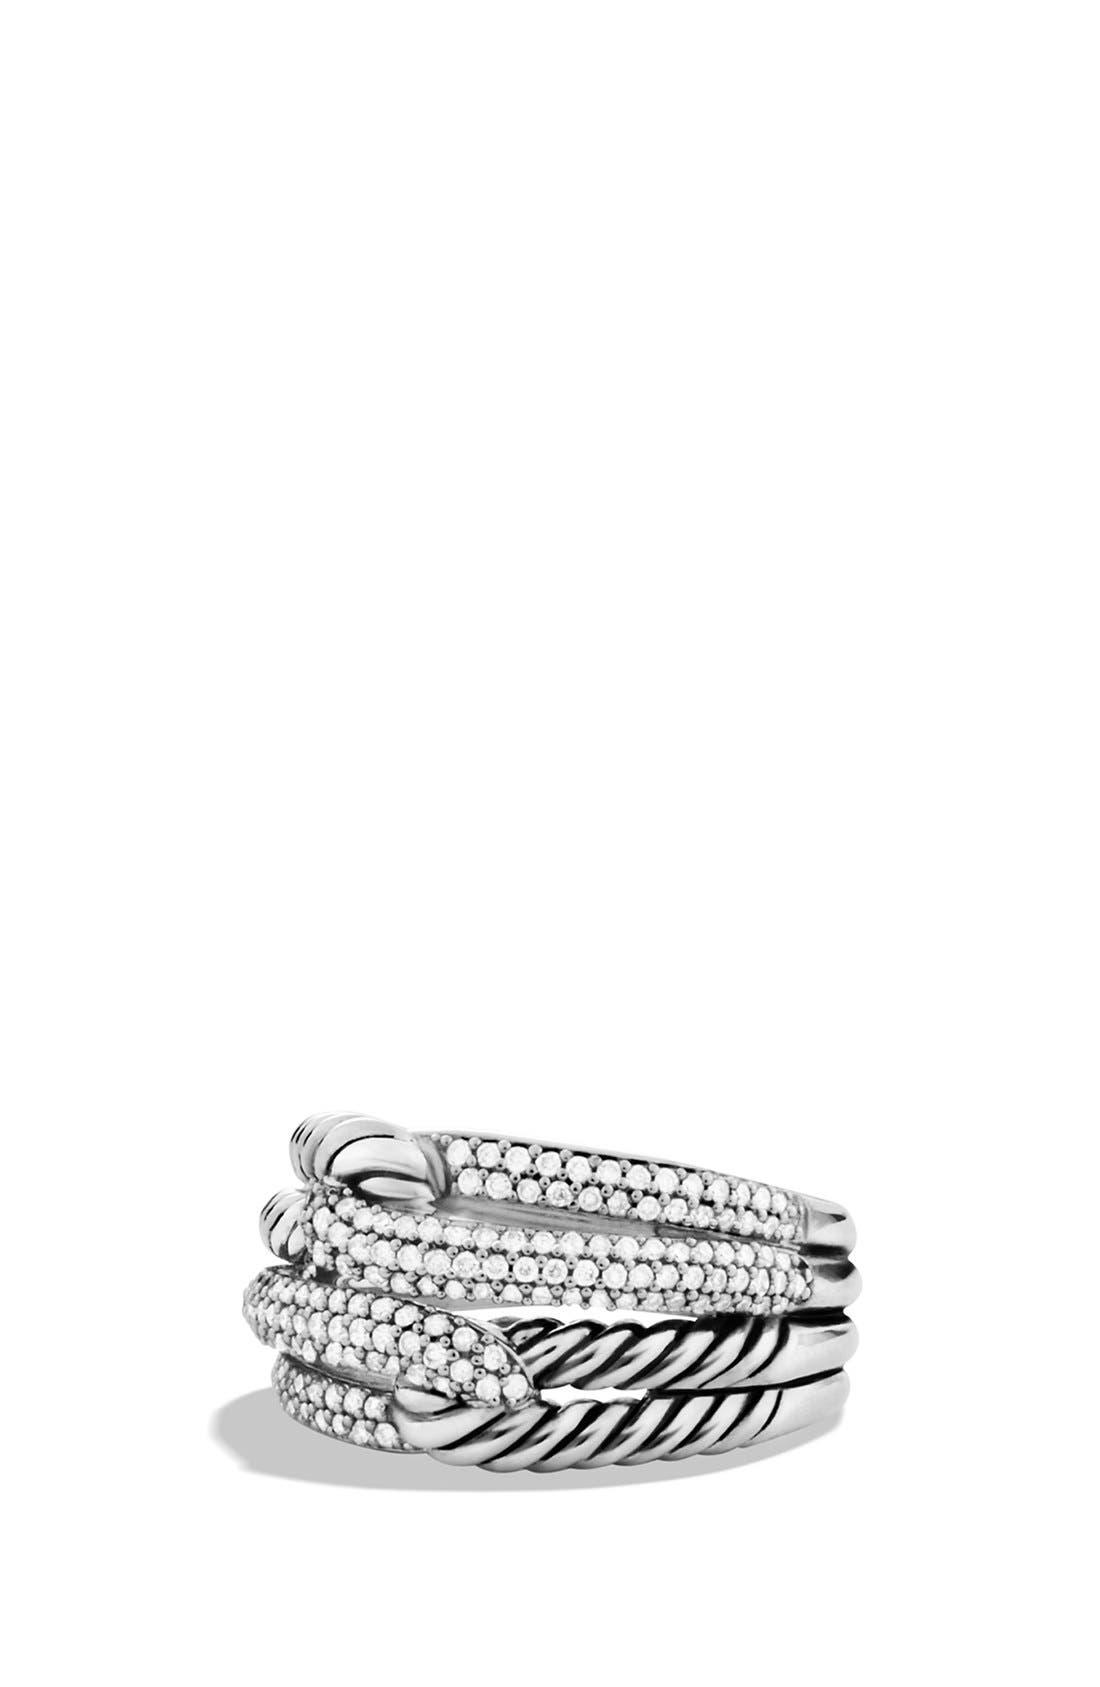 David Yurman 'Labyrinth' Double-Loop Ring with Diamonds